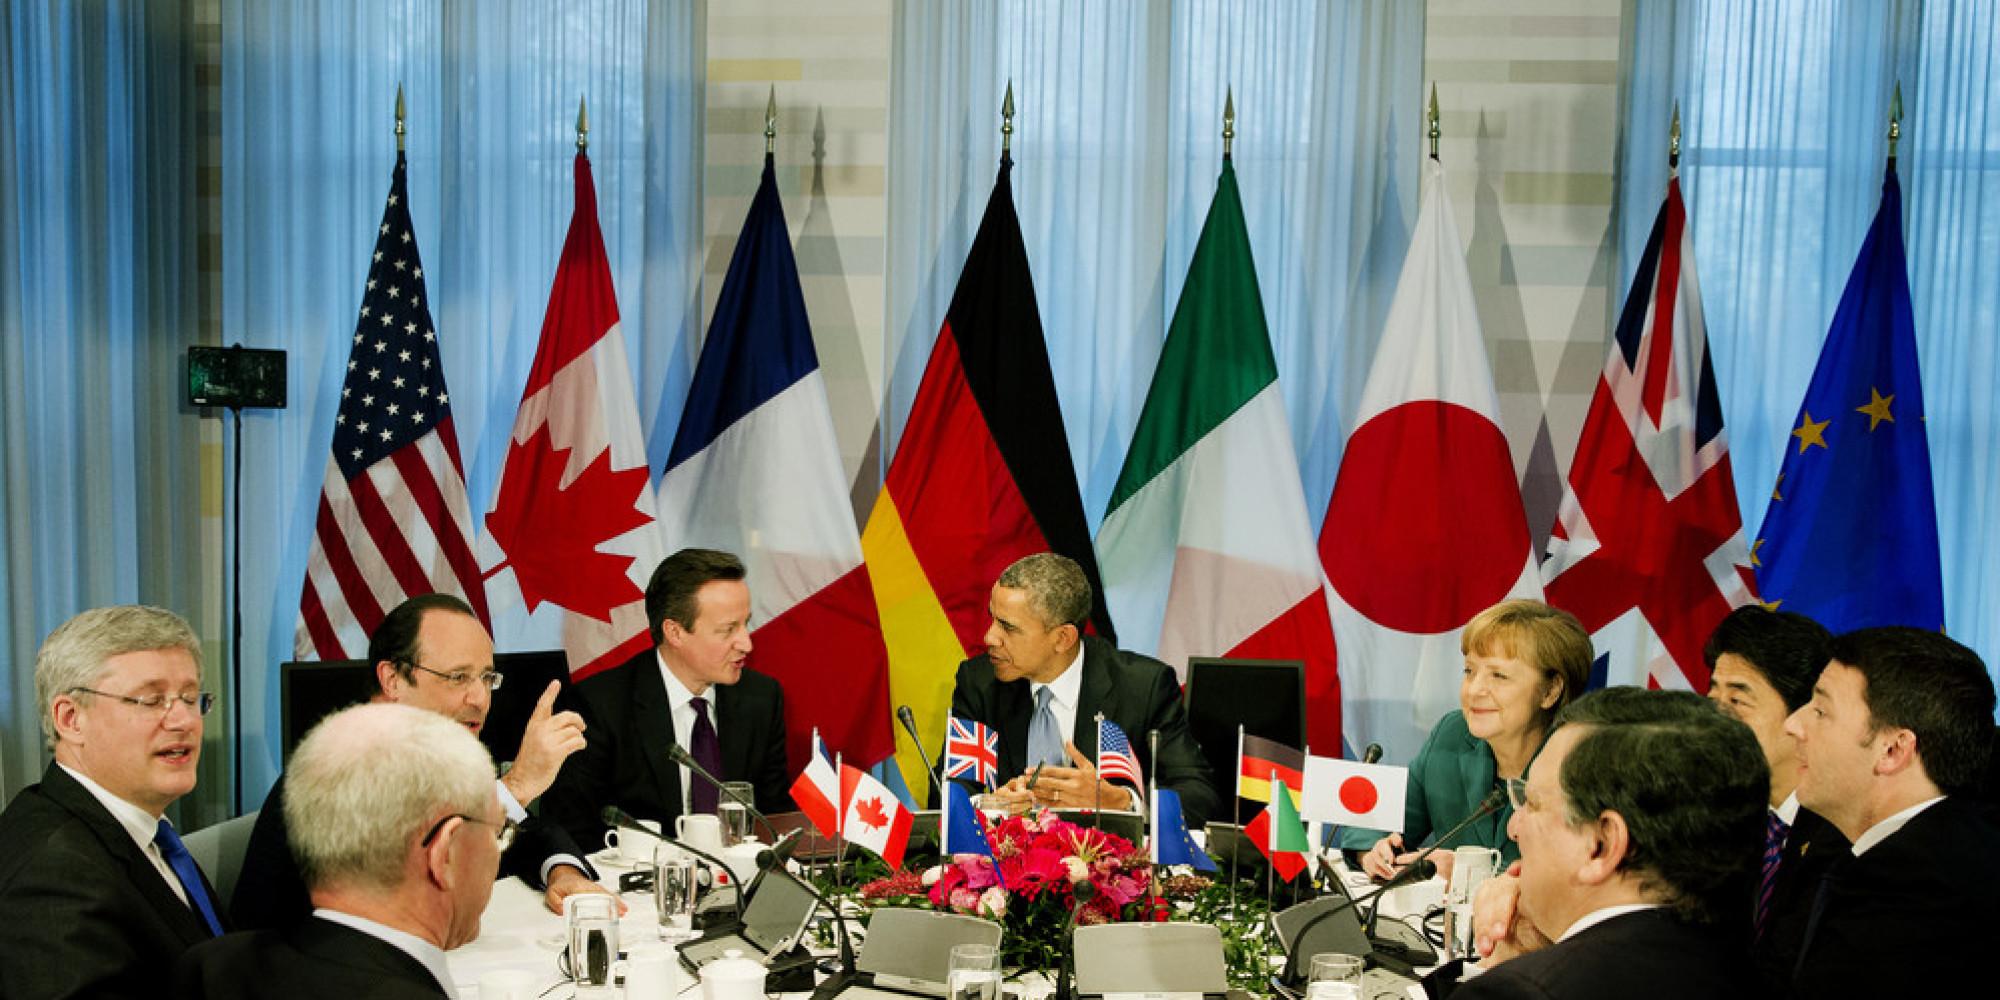 http://i.huffpost.com/gen/1703283/thumbs/o-RUSSIA-SANCTIONS-facebook.jpg